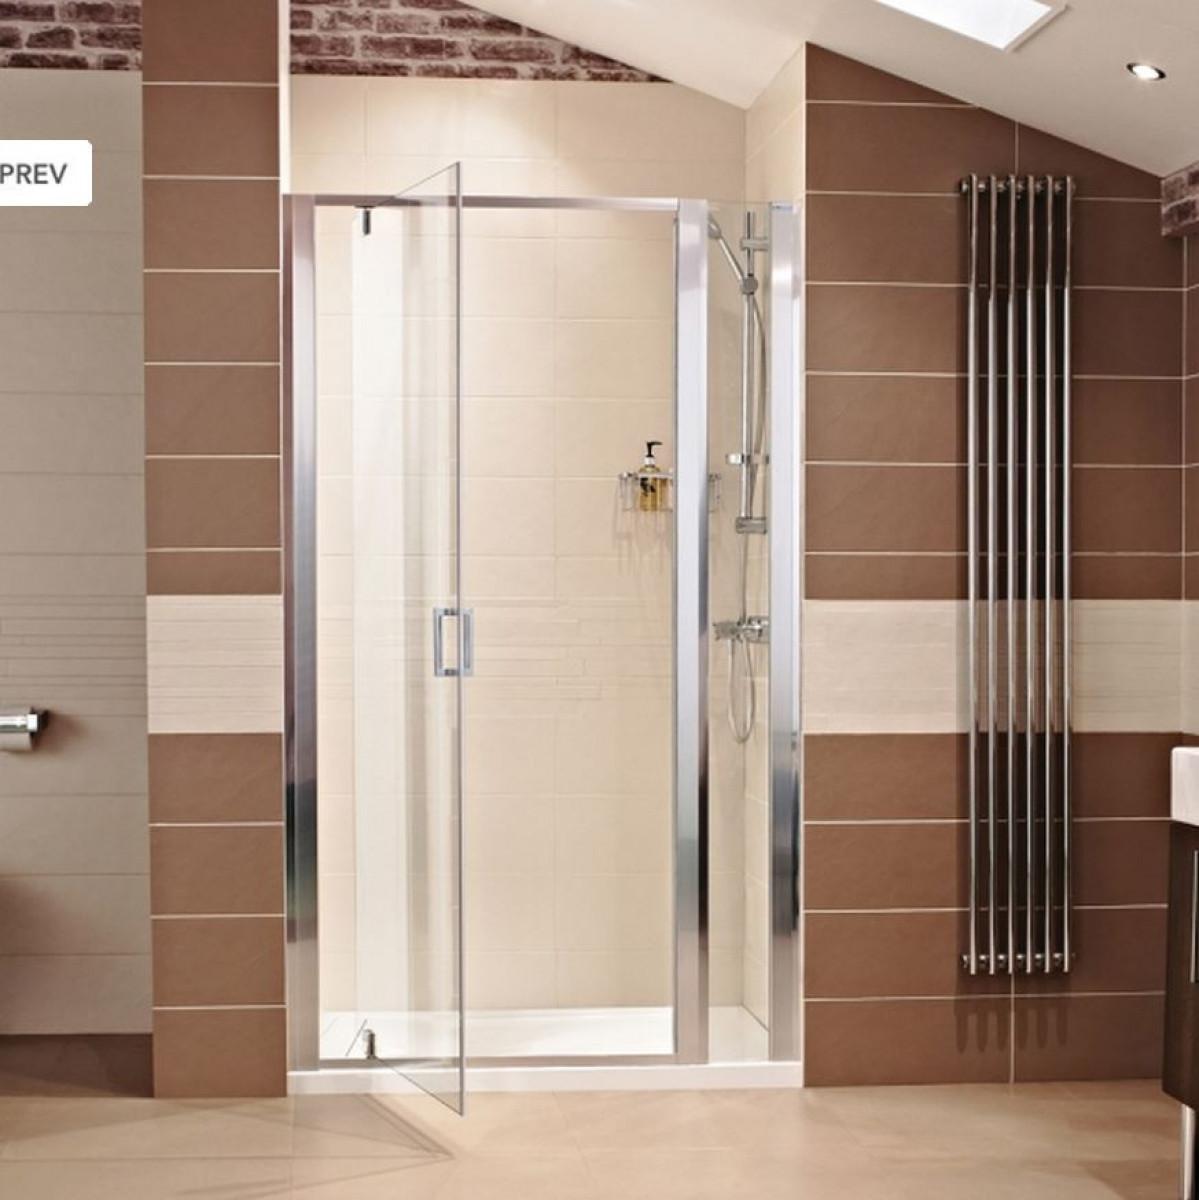 1000mm pivot shower door merlyn 10 series 1000mm pivot for 1000mm pivot shower door